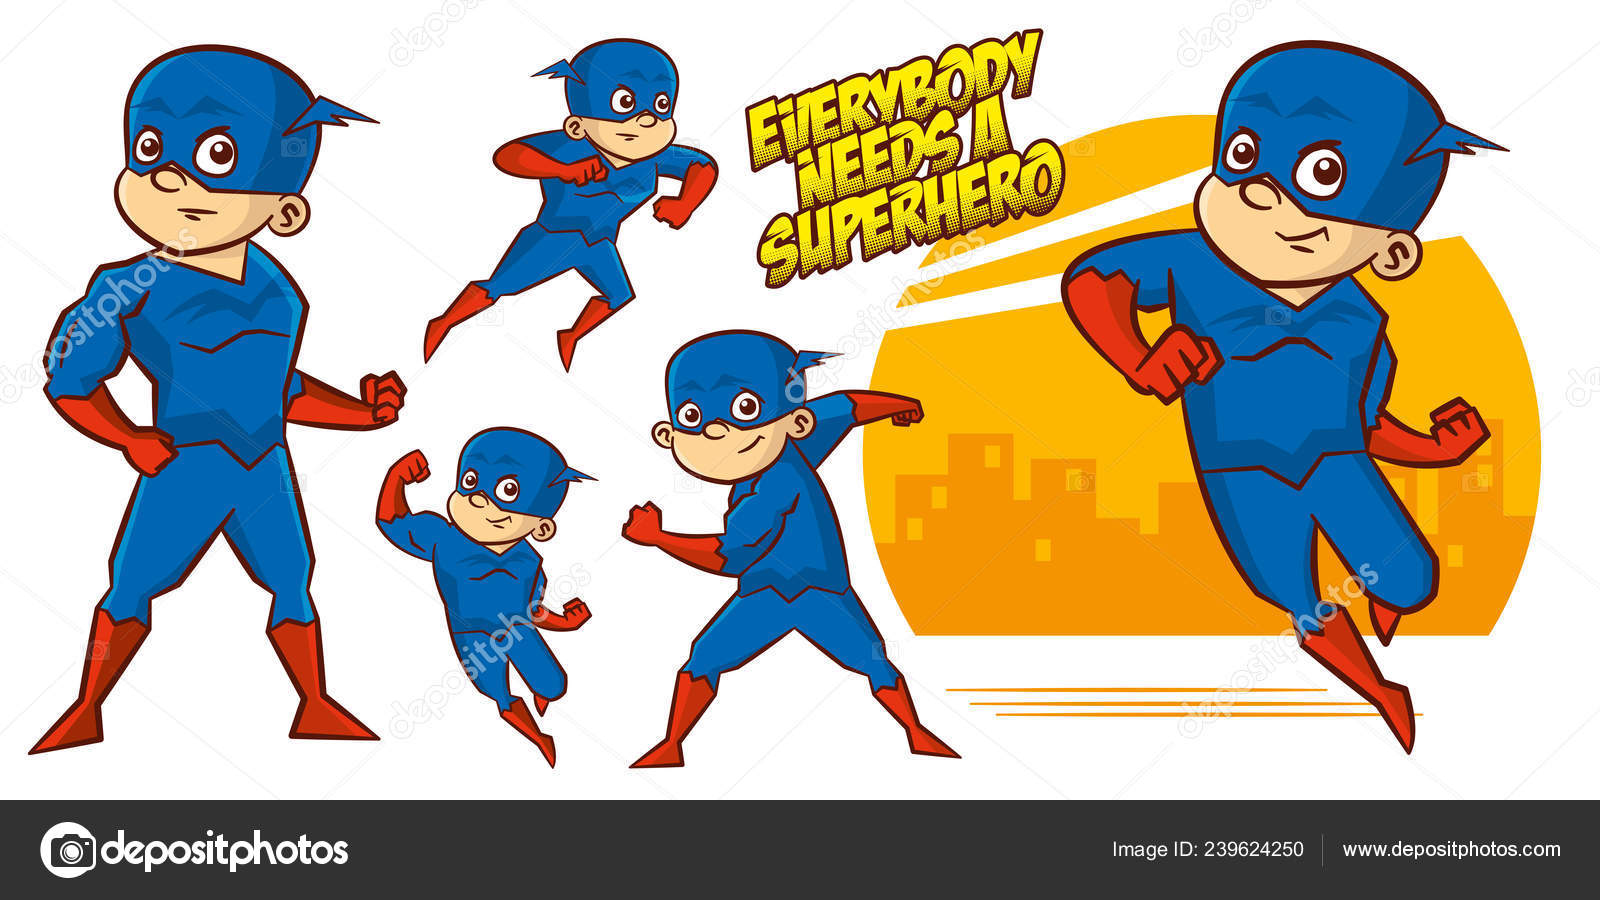 0c25dea4131cb Superhero character Superheroes Set Vector illustration design — Stock  Vector